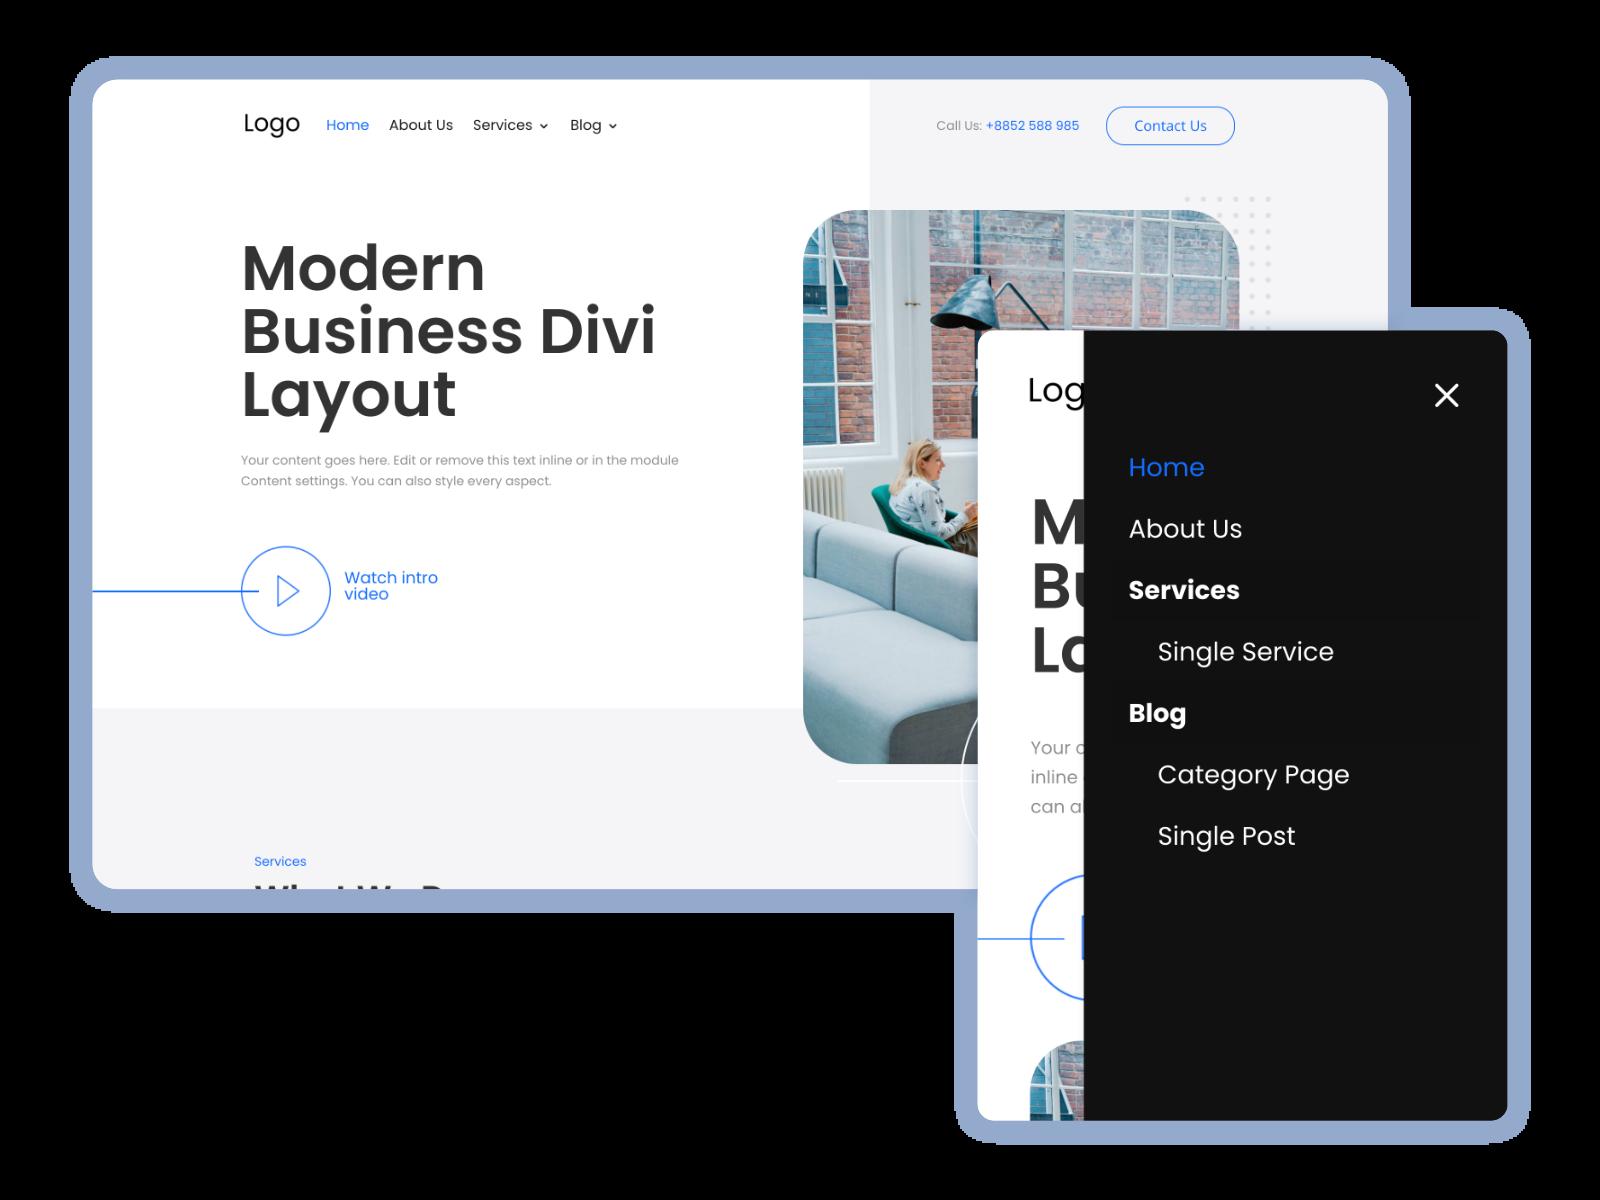 Premium Layout: Modern Business for Divi